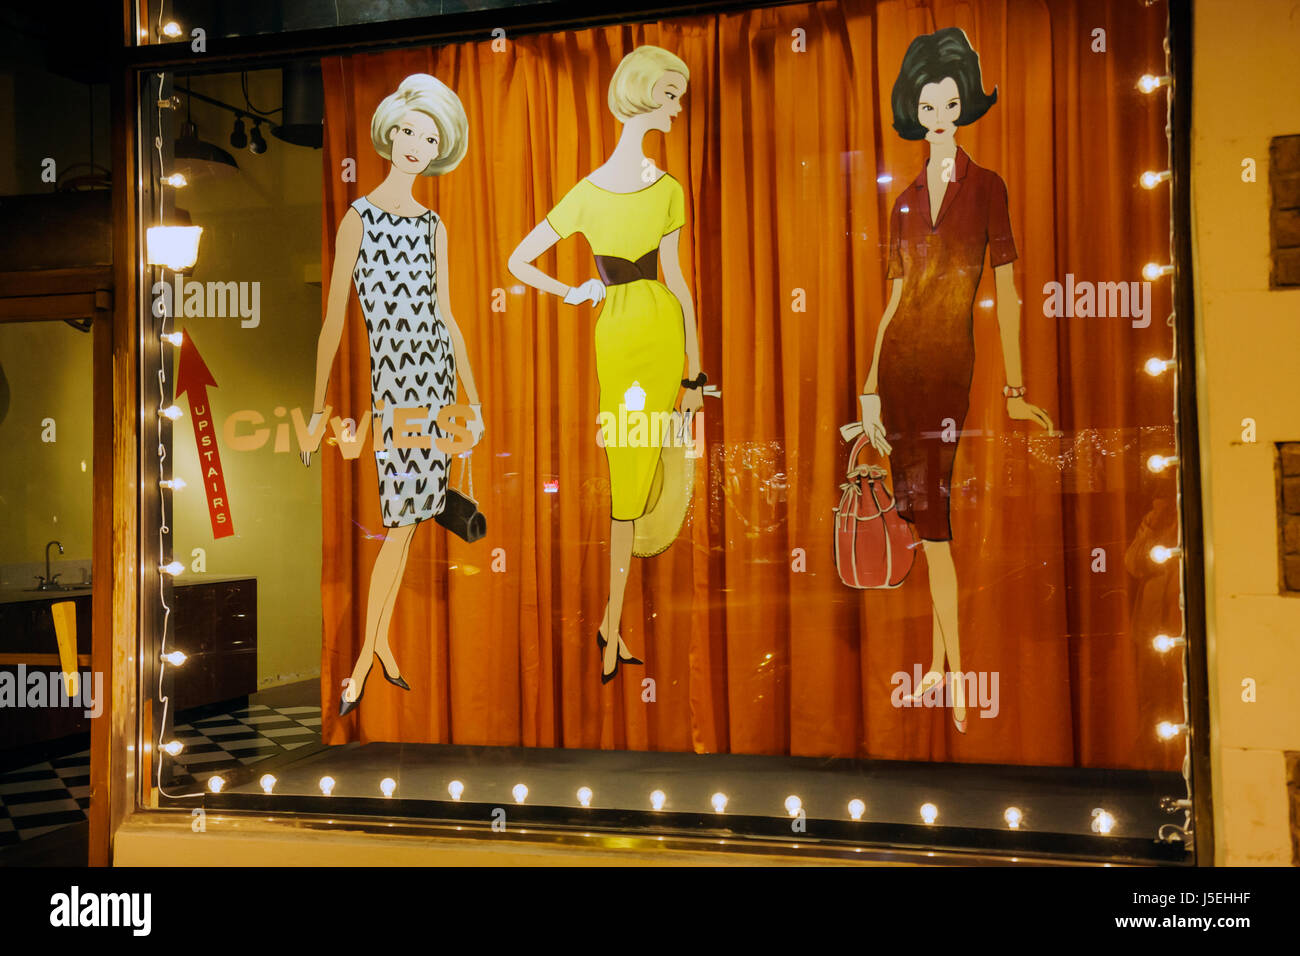 Savannah Georgia Historic District Broughton Street store window shop wood cutout fashion design 1960s sixties style - Stock Image